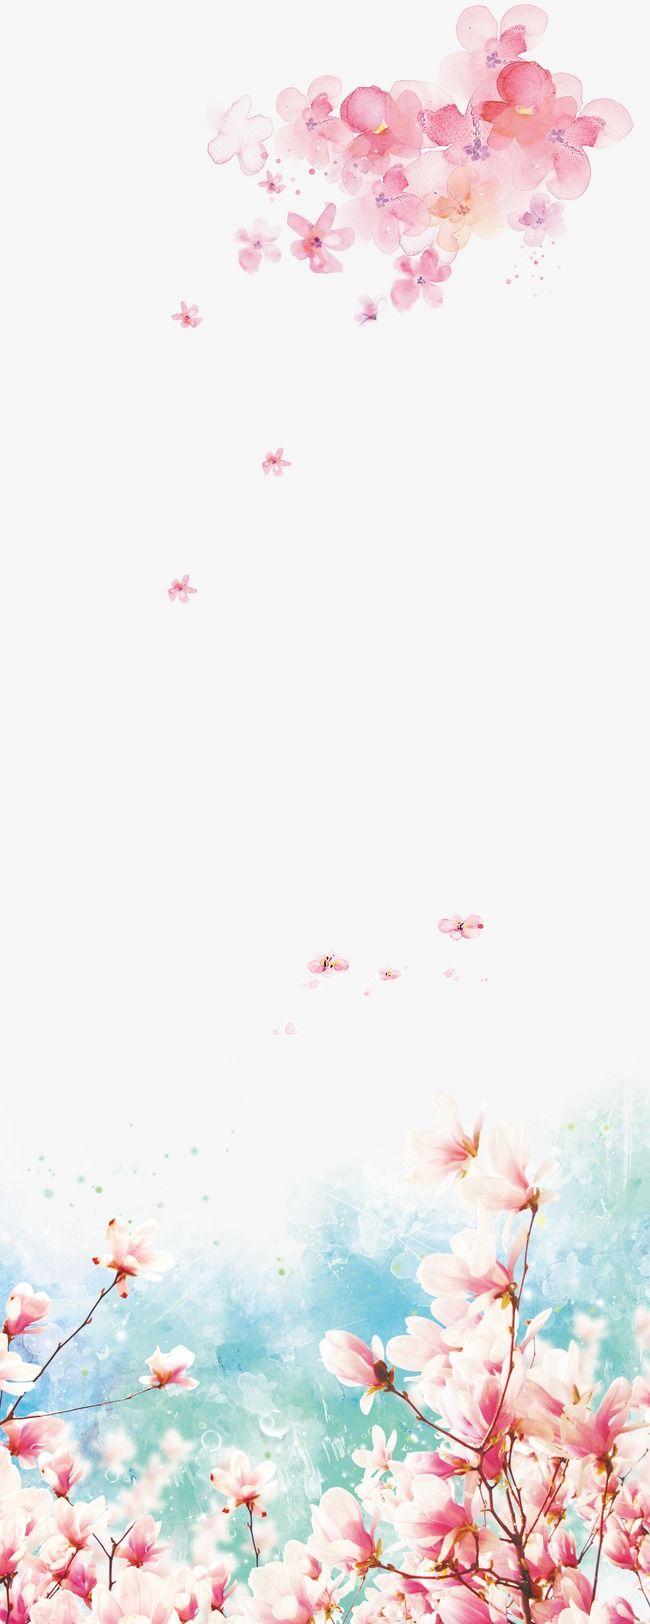 Tinta rosa flores waft background, Pintado, Tinta, Flores De Color Rosa PNG y PSD